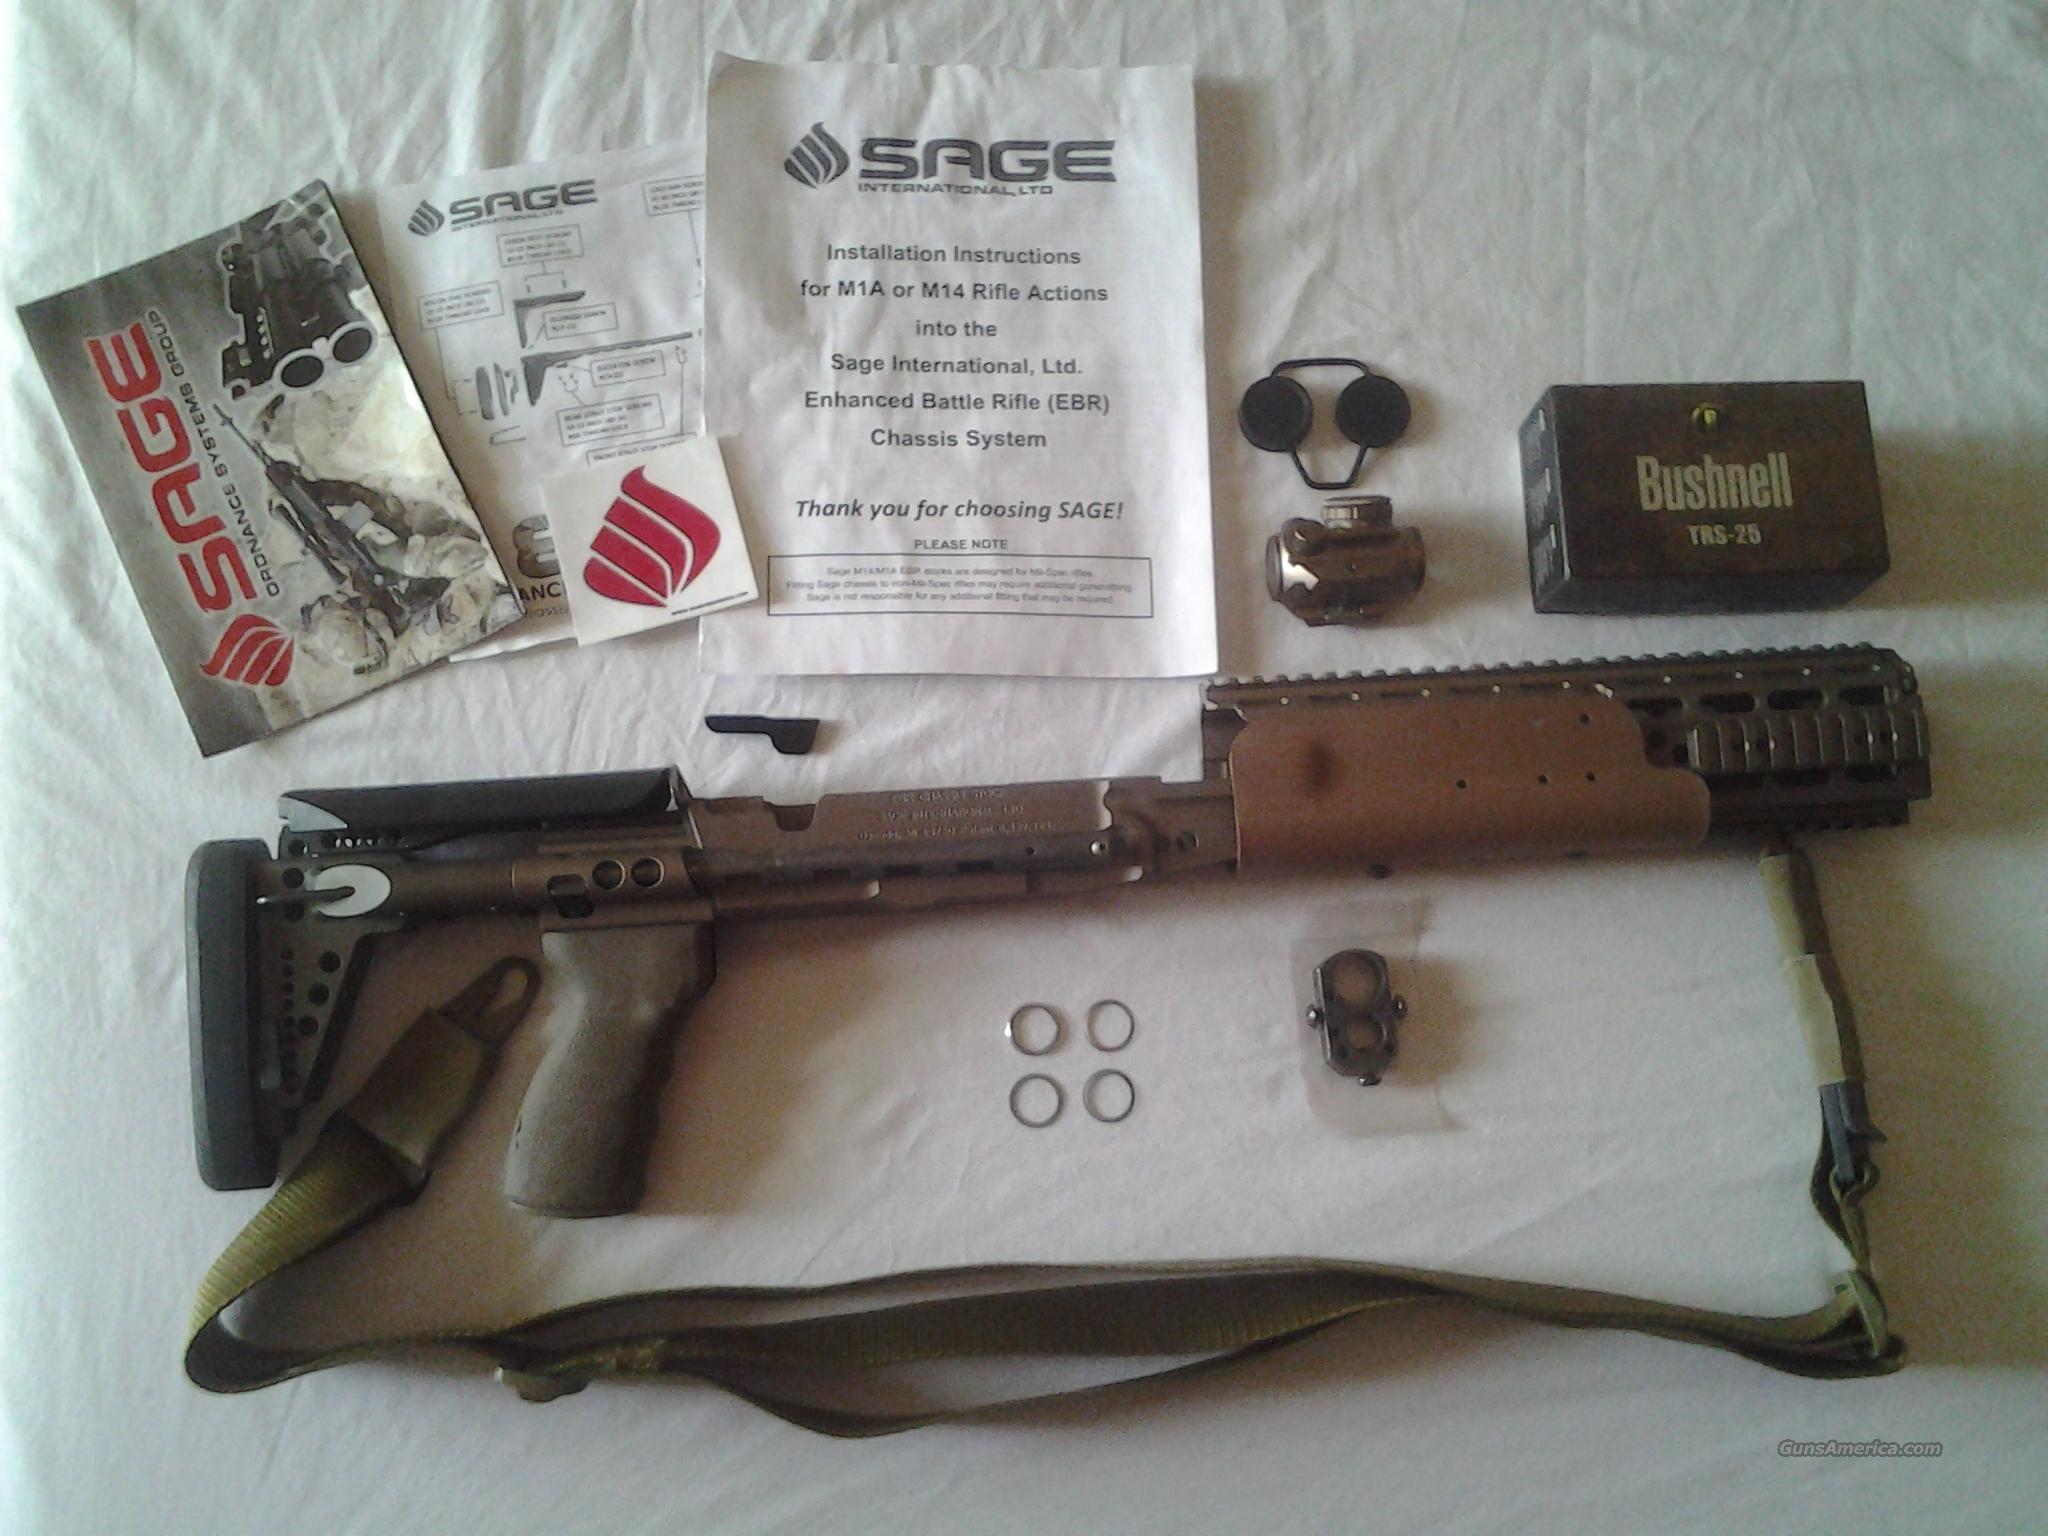 Sage EBR for M14/M1A